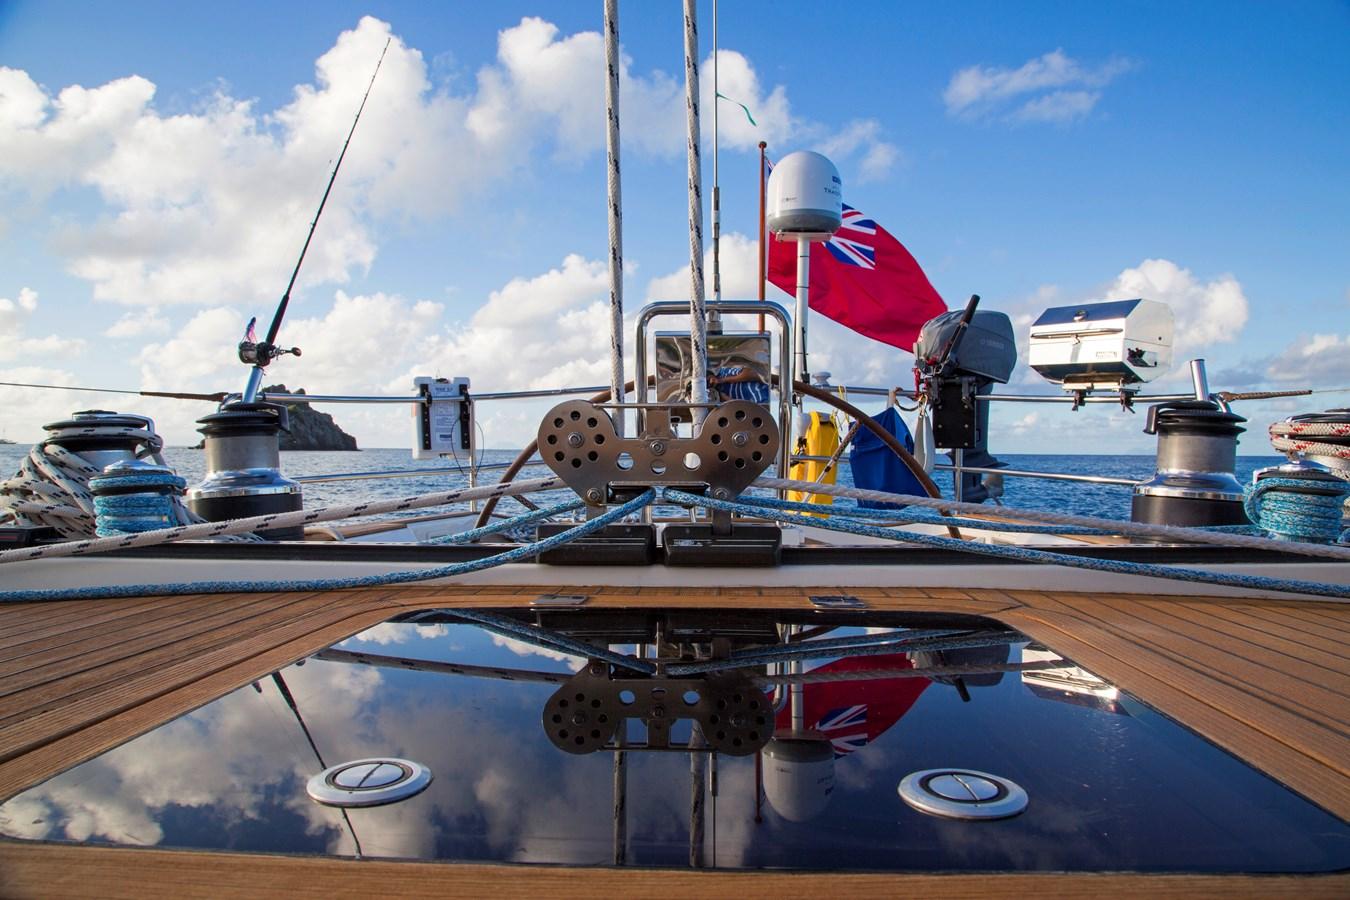 121314BTSC-0629 3 SWAN SWAN 68 Cruising Sailboat 2586750